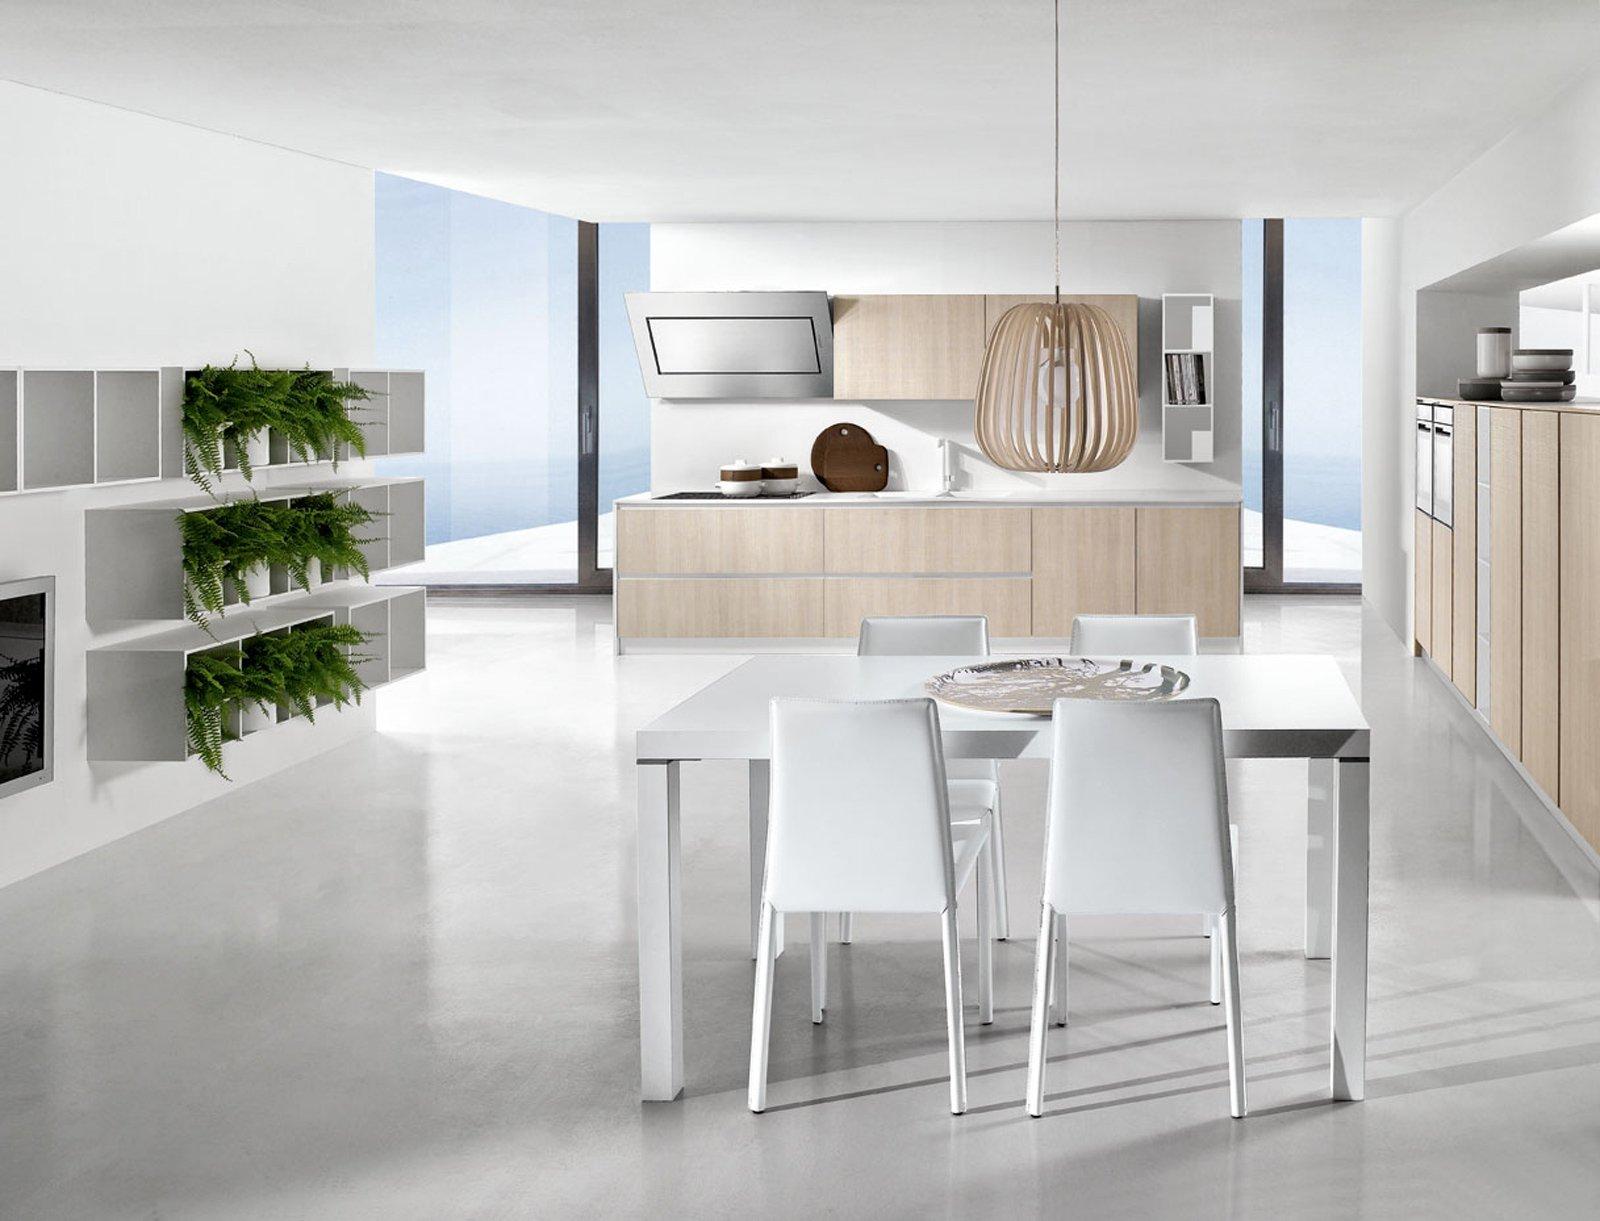 Cucina in legno moderna o classica cose di casa for Decoracion interiores cocina